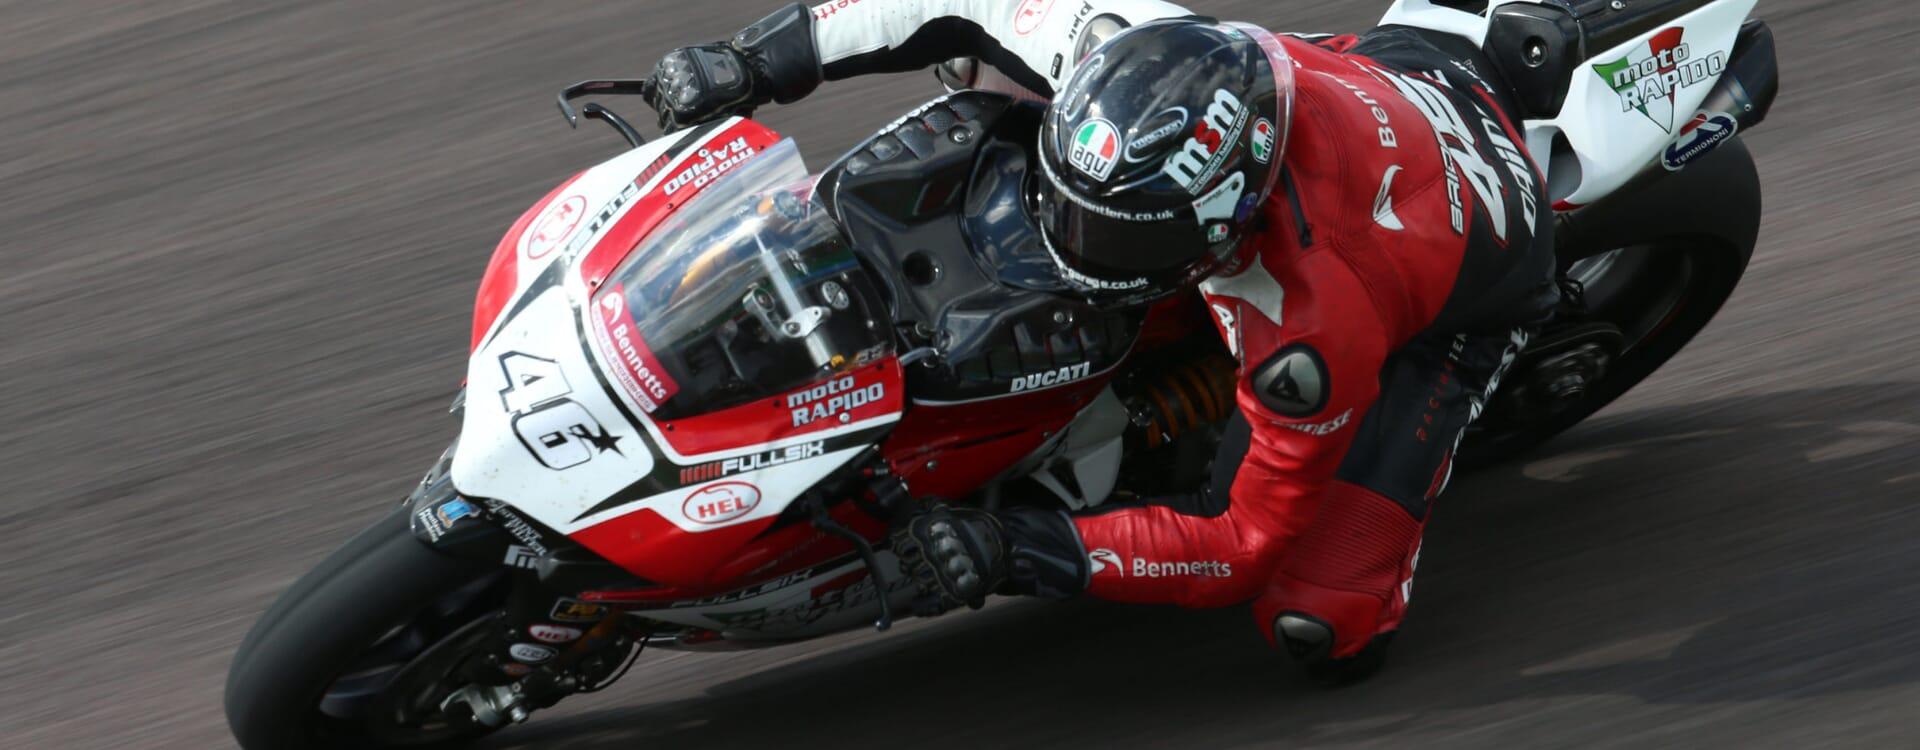 BSB VIP British Super bike corporate sports hospitality race racing superbike